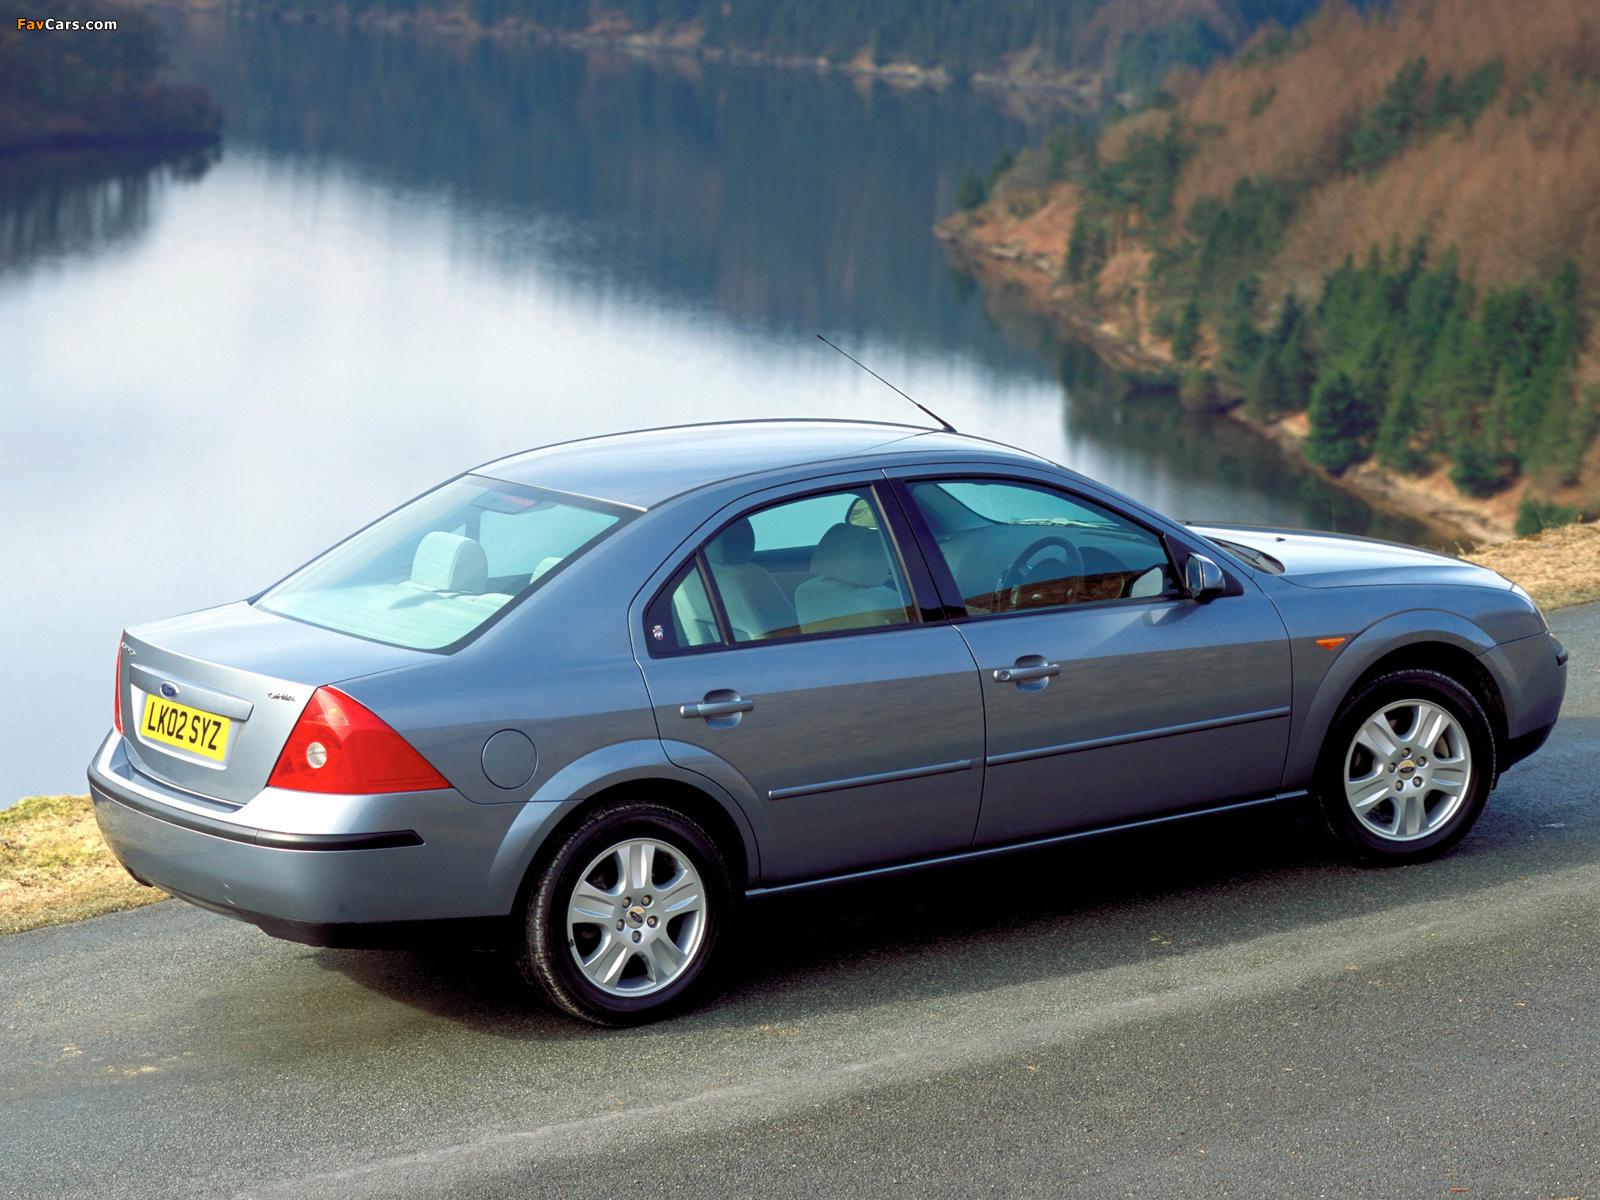 Ford Mondeo (Форд Мондео) - Продажа, Цены, Отзывы, Фото ...